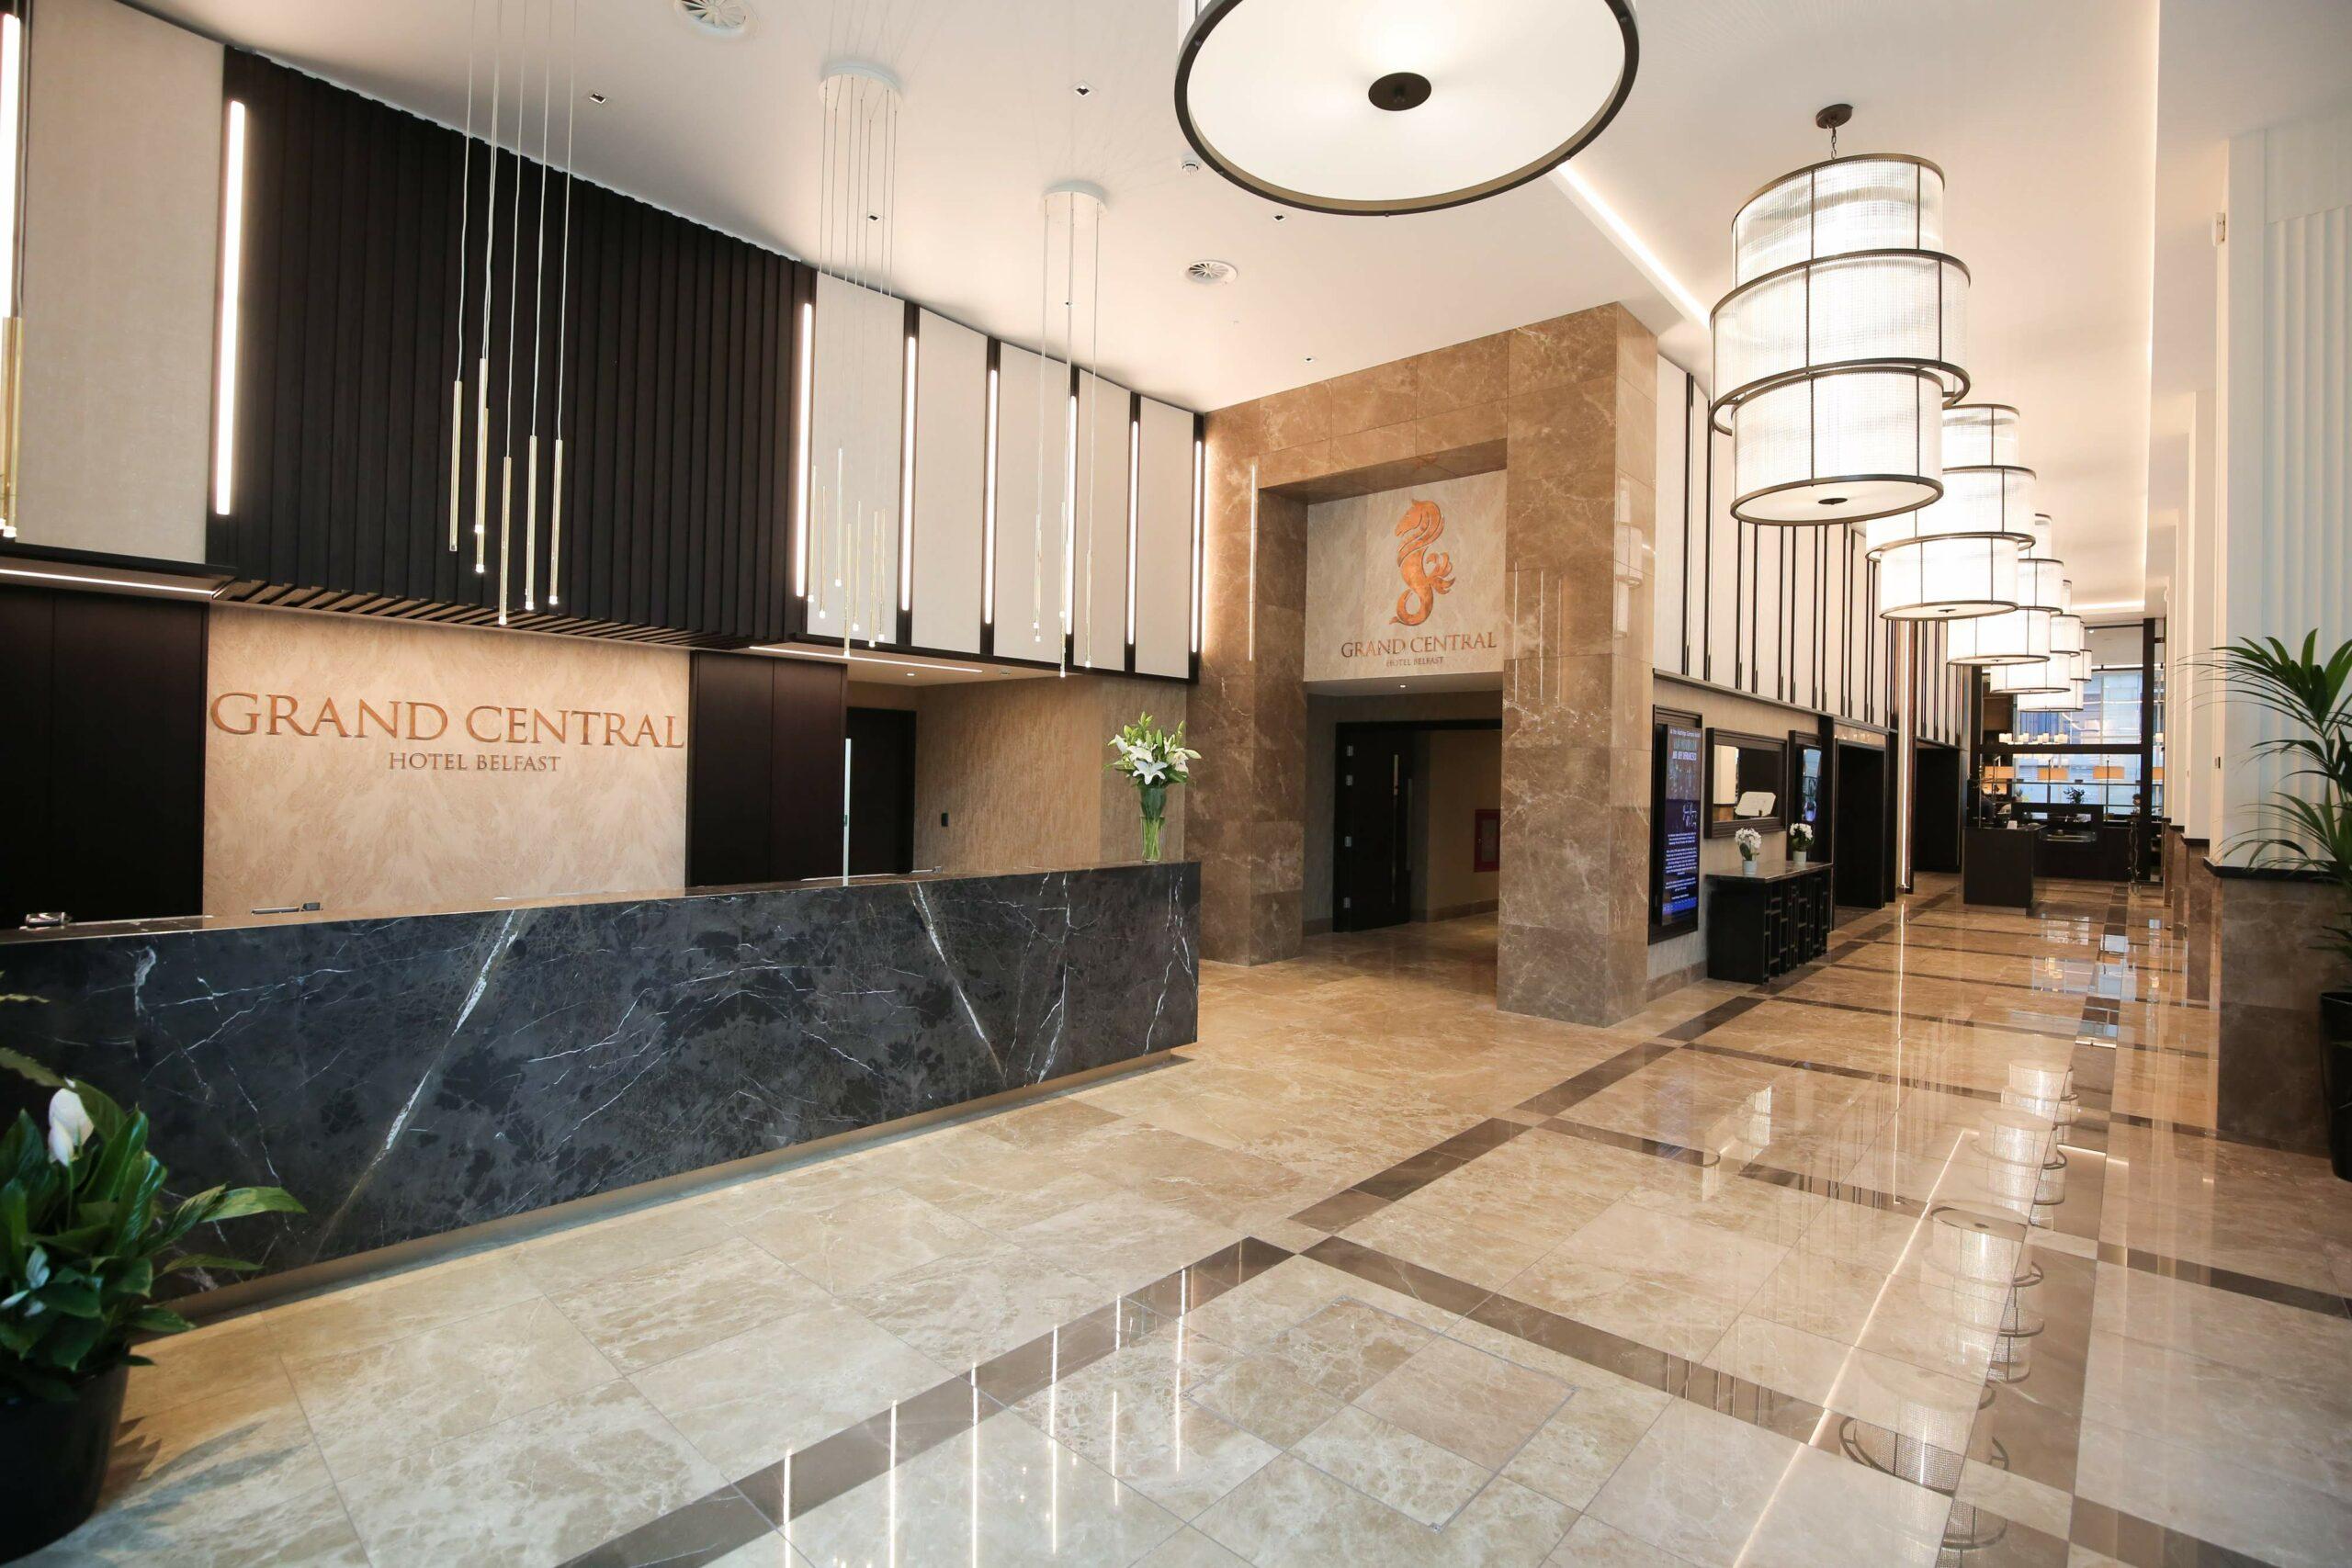 Hastings Hotels, Northern Ireland